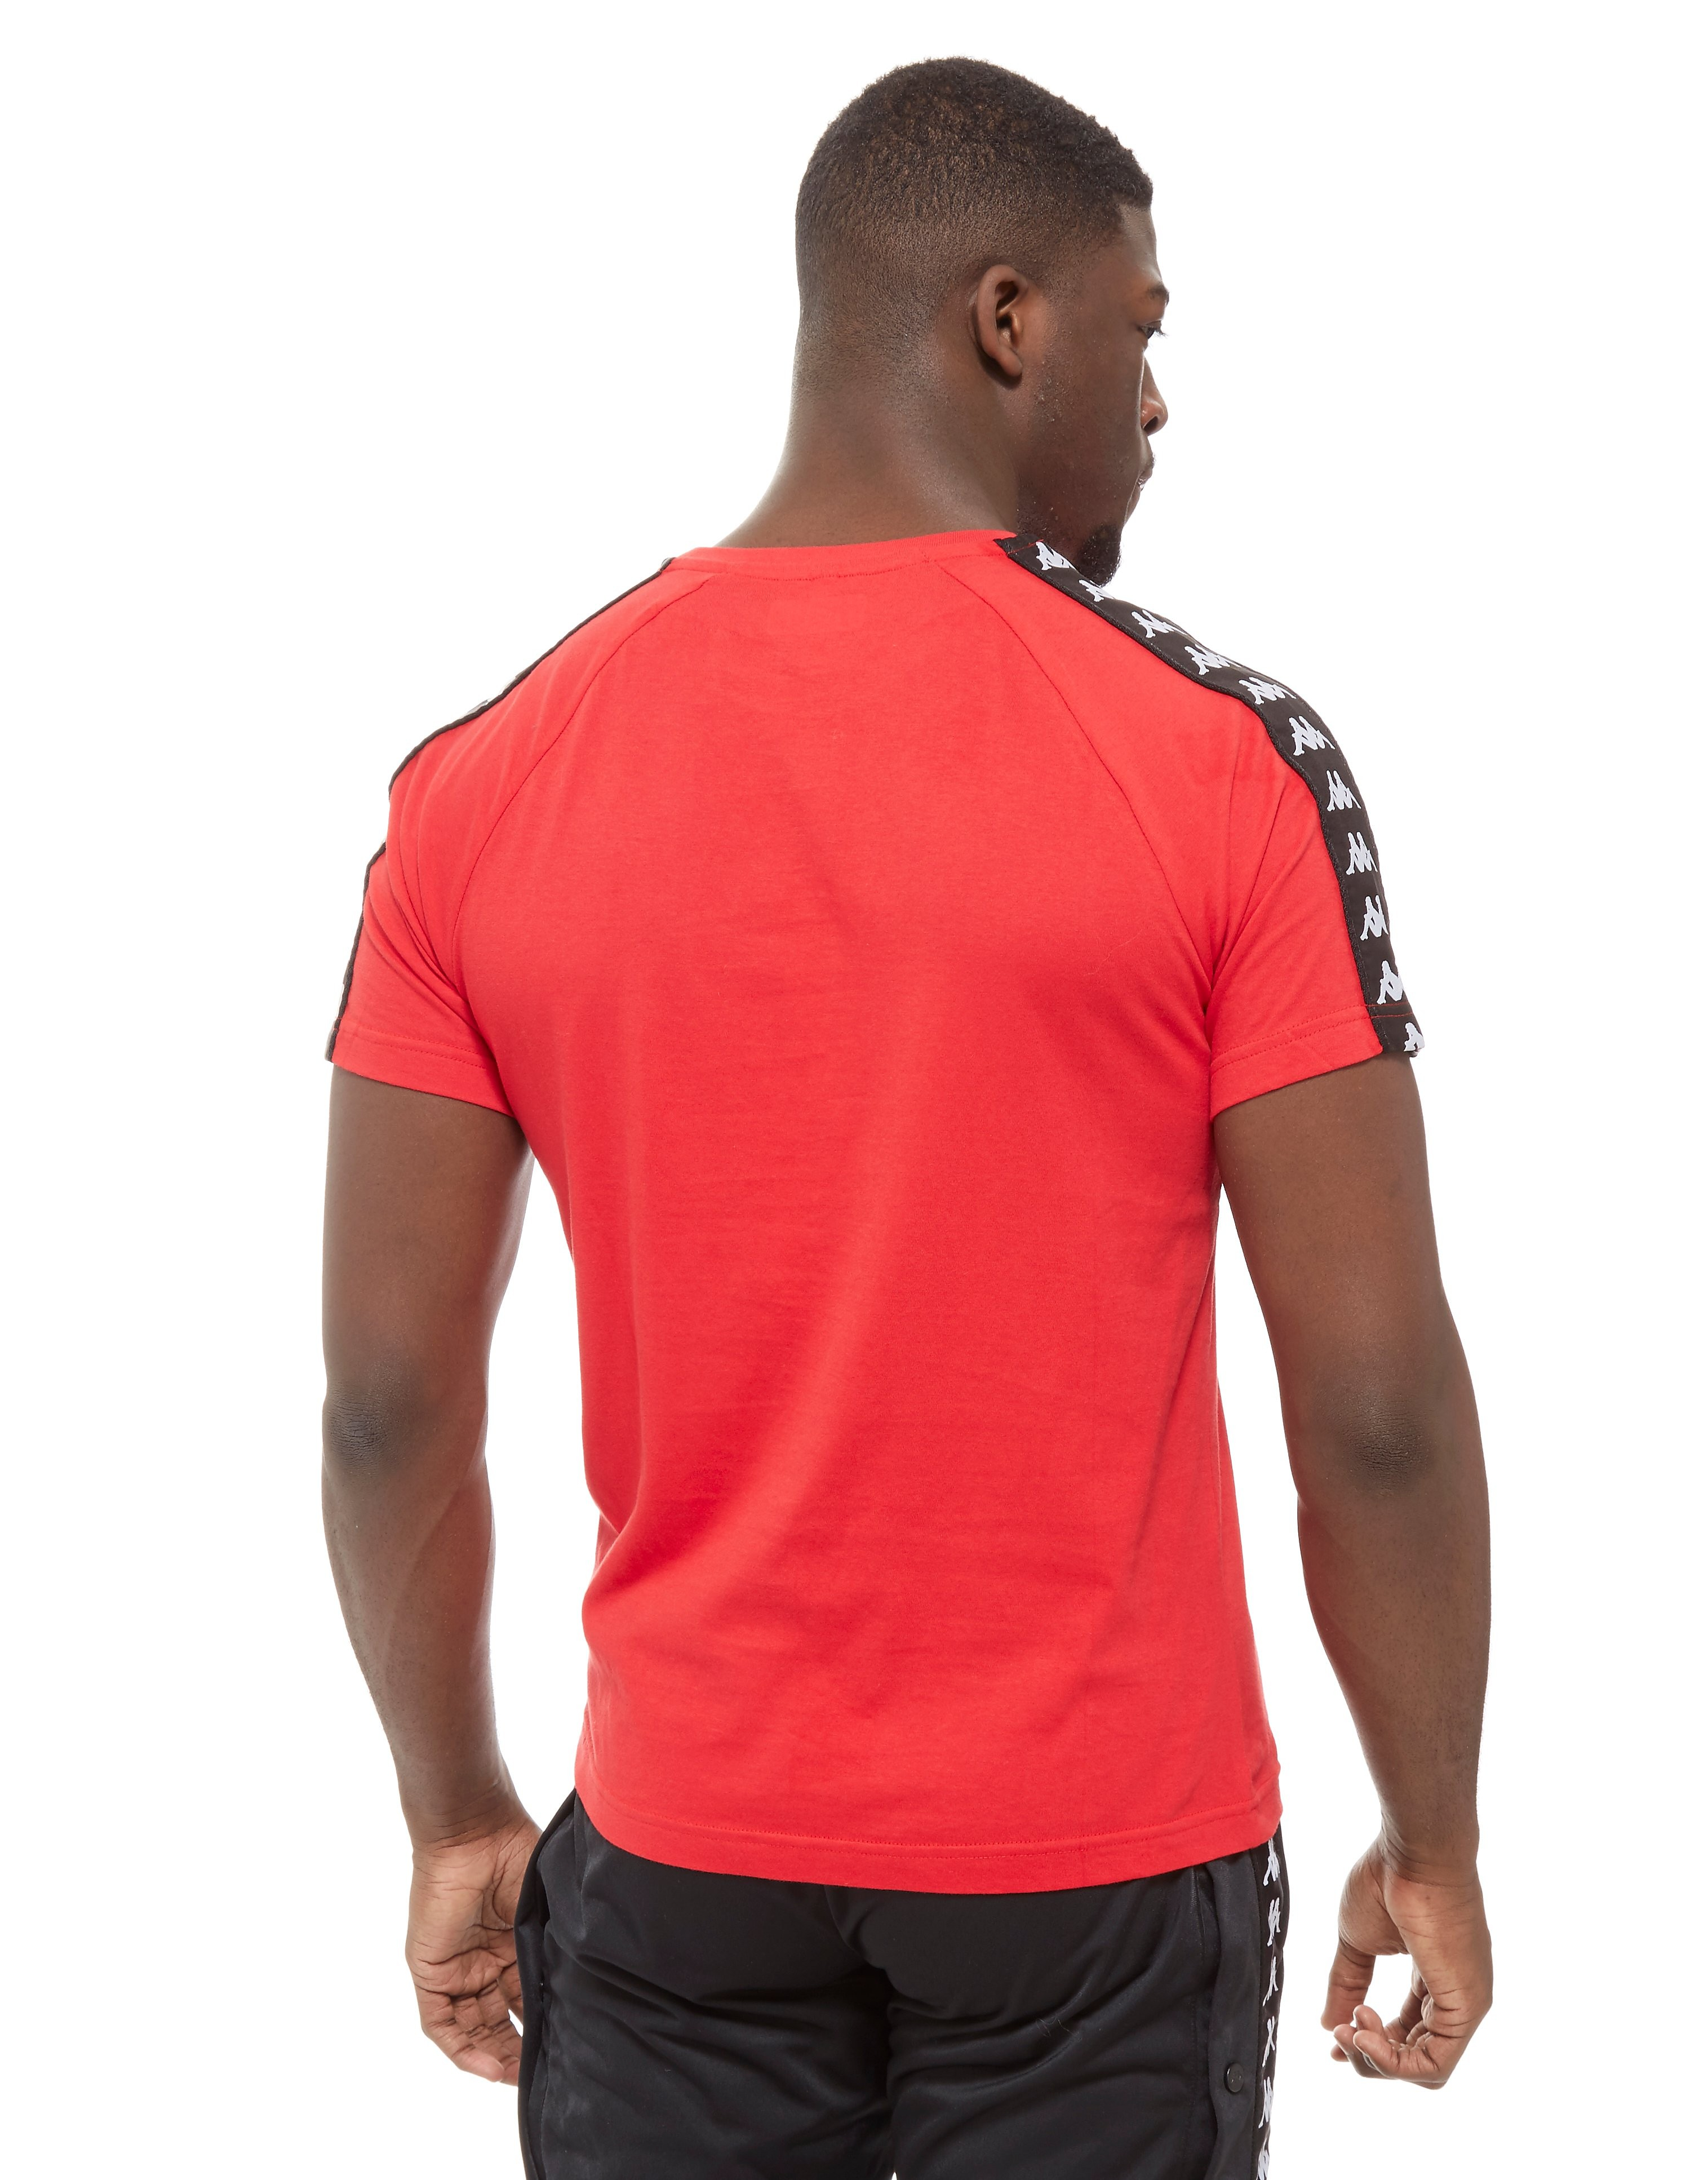 Kappa Coen T-Shirt